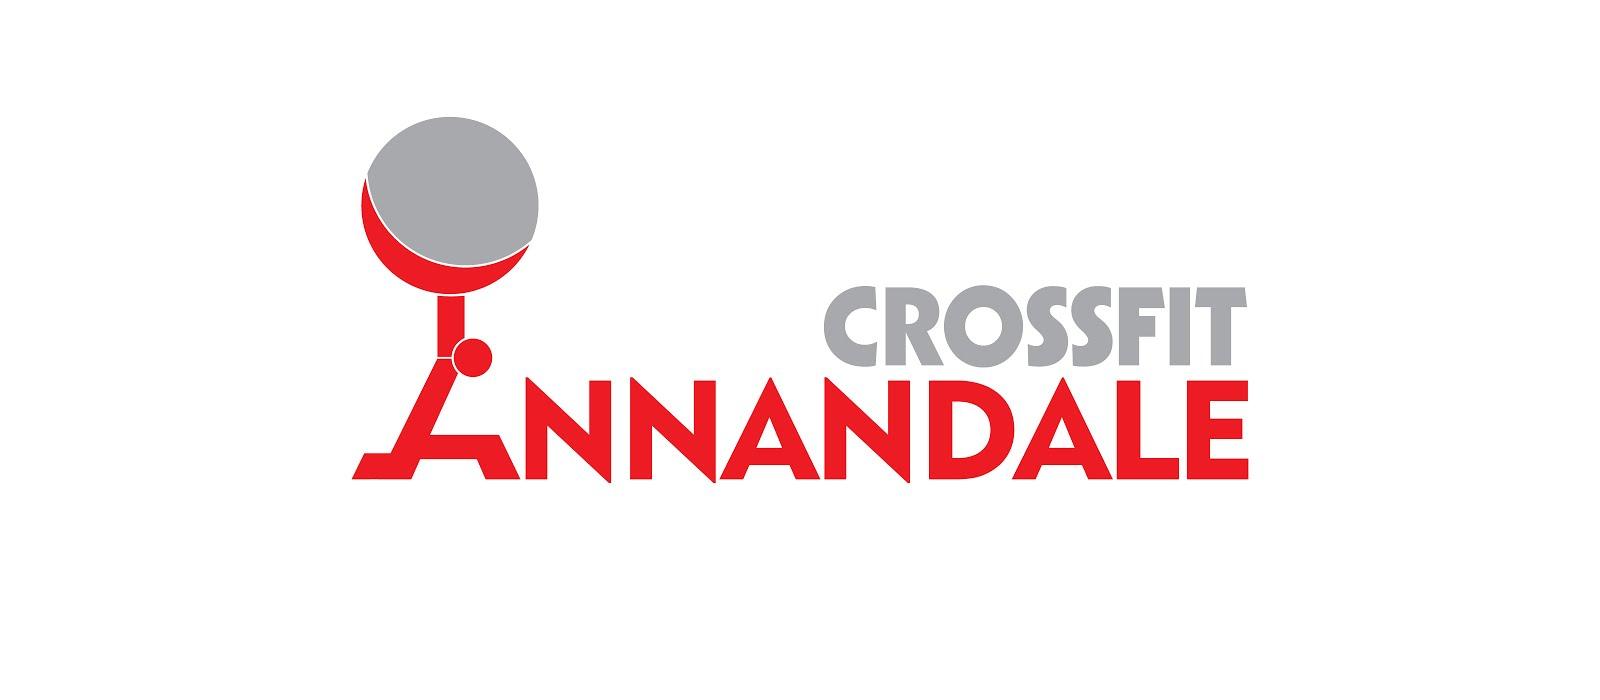 Crossfit Annandale